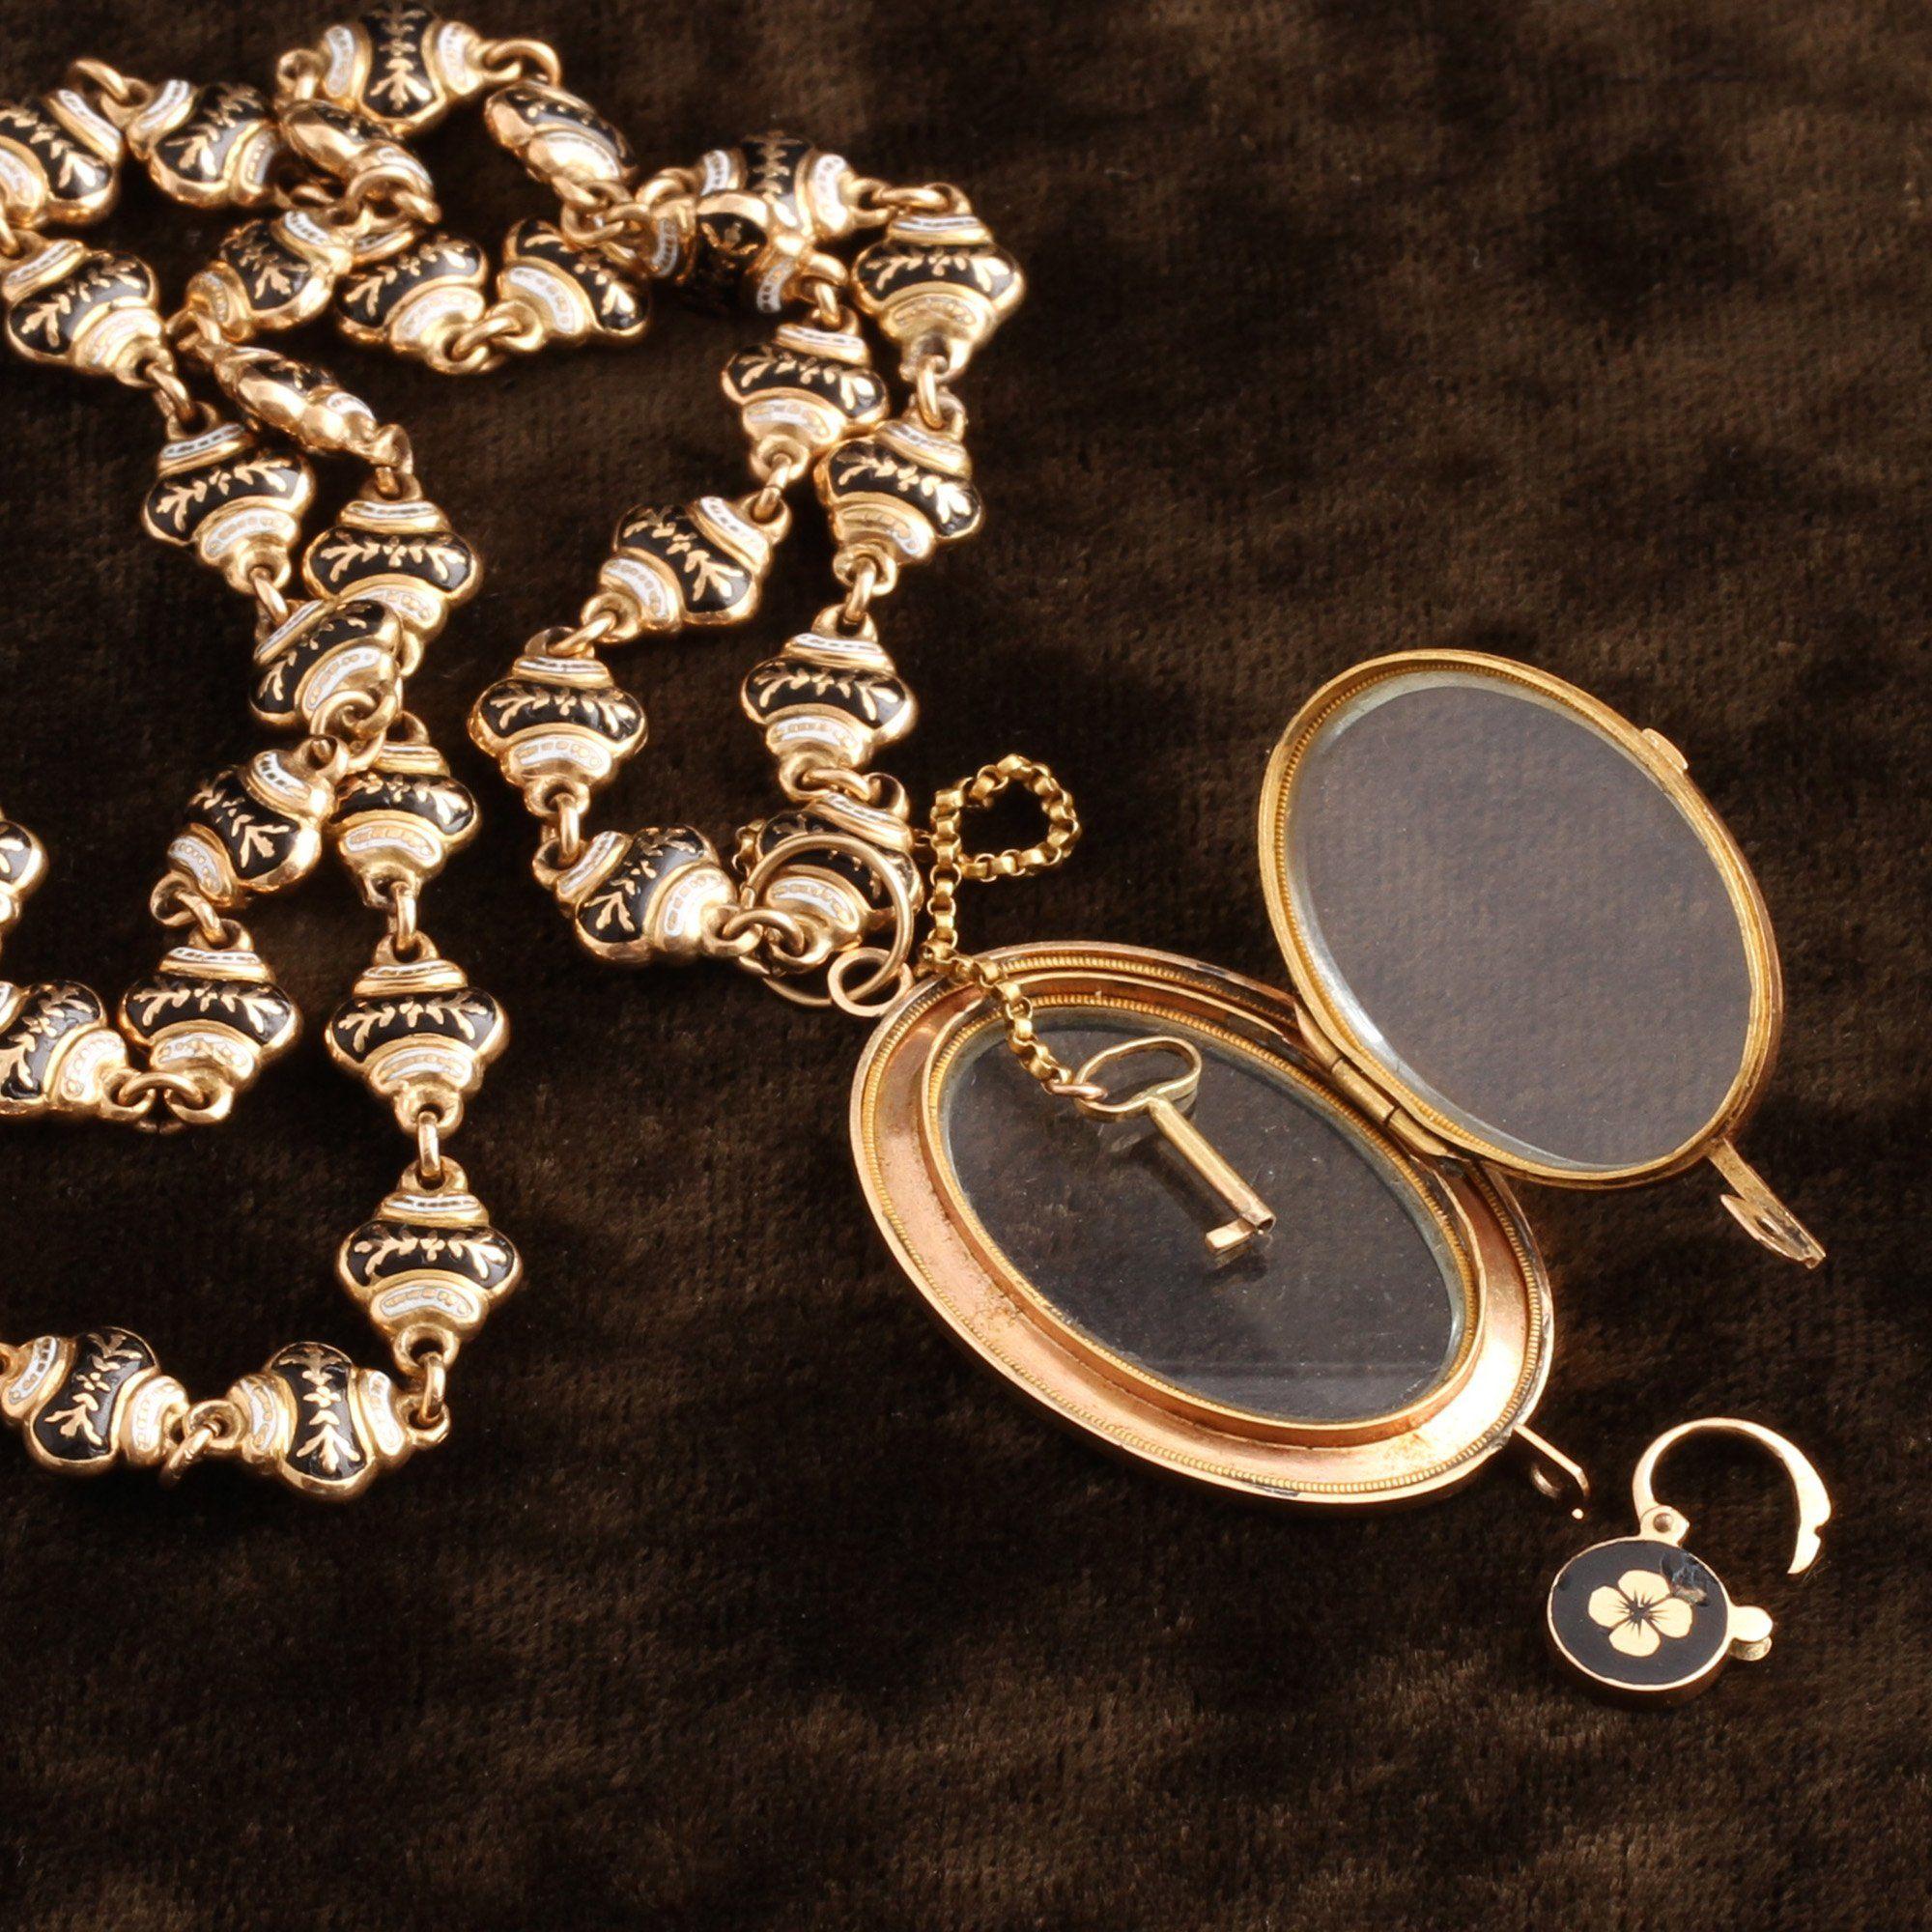 Mid 19th Century Swiss Enamel Necklace with Locket, Padlock and Key